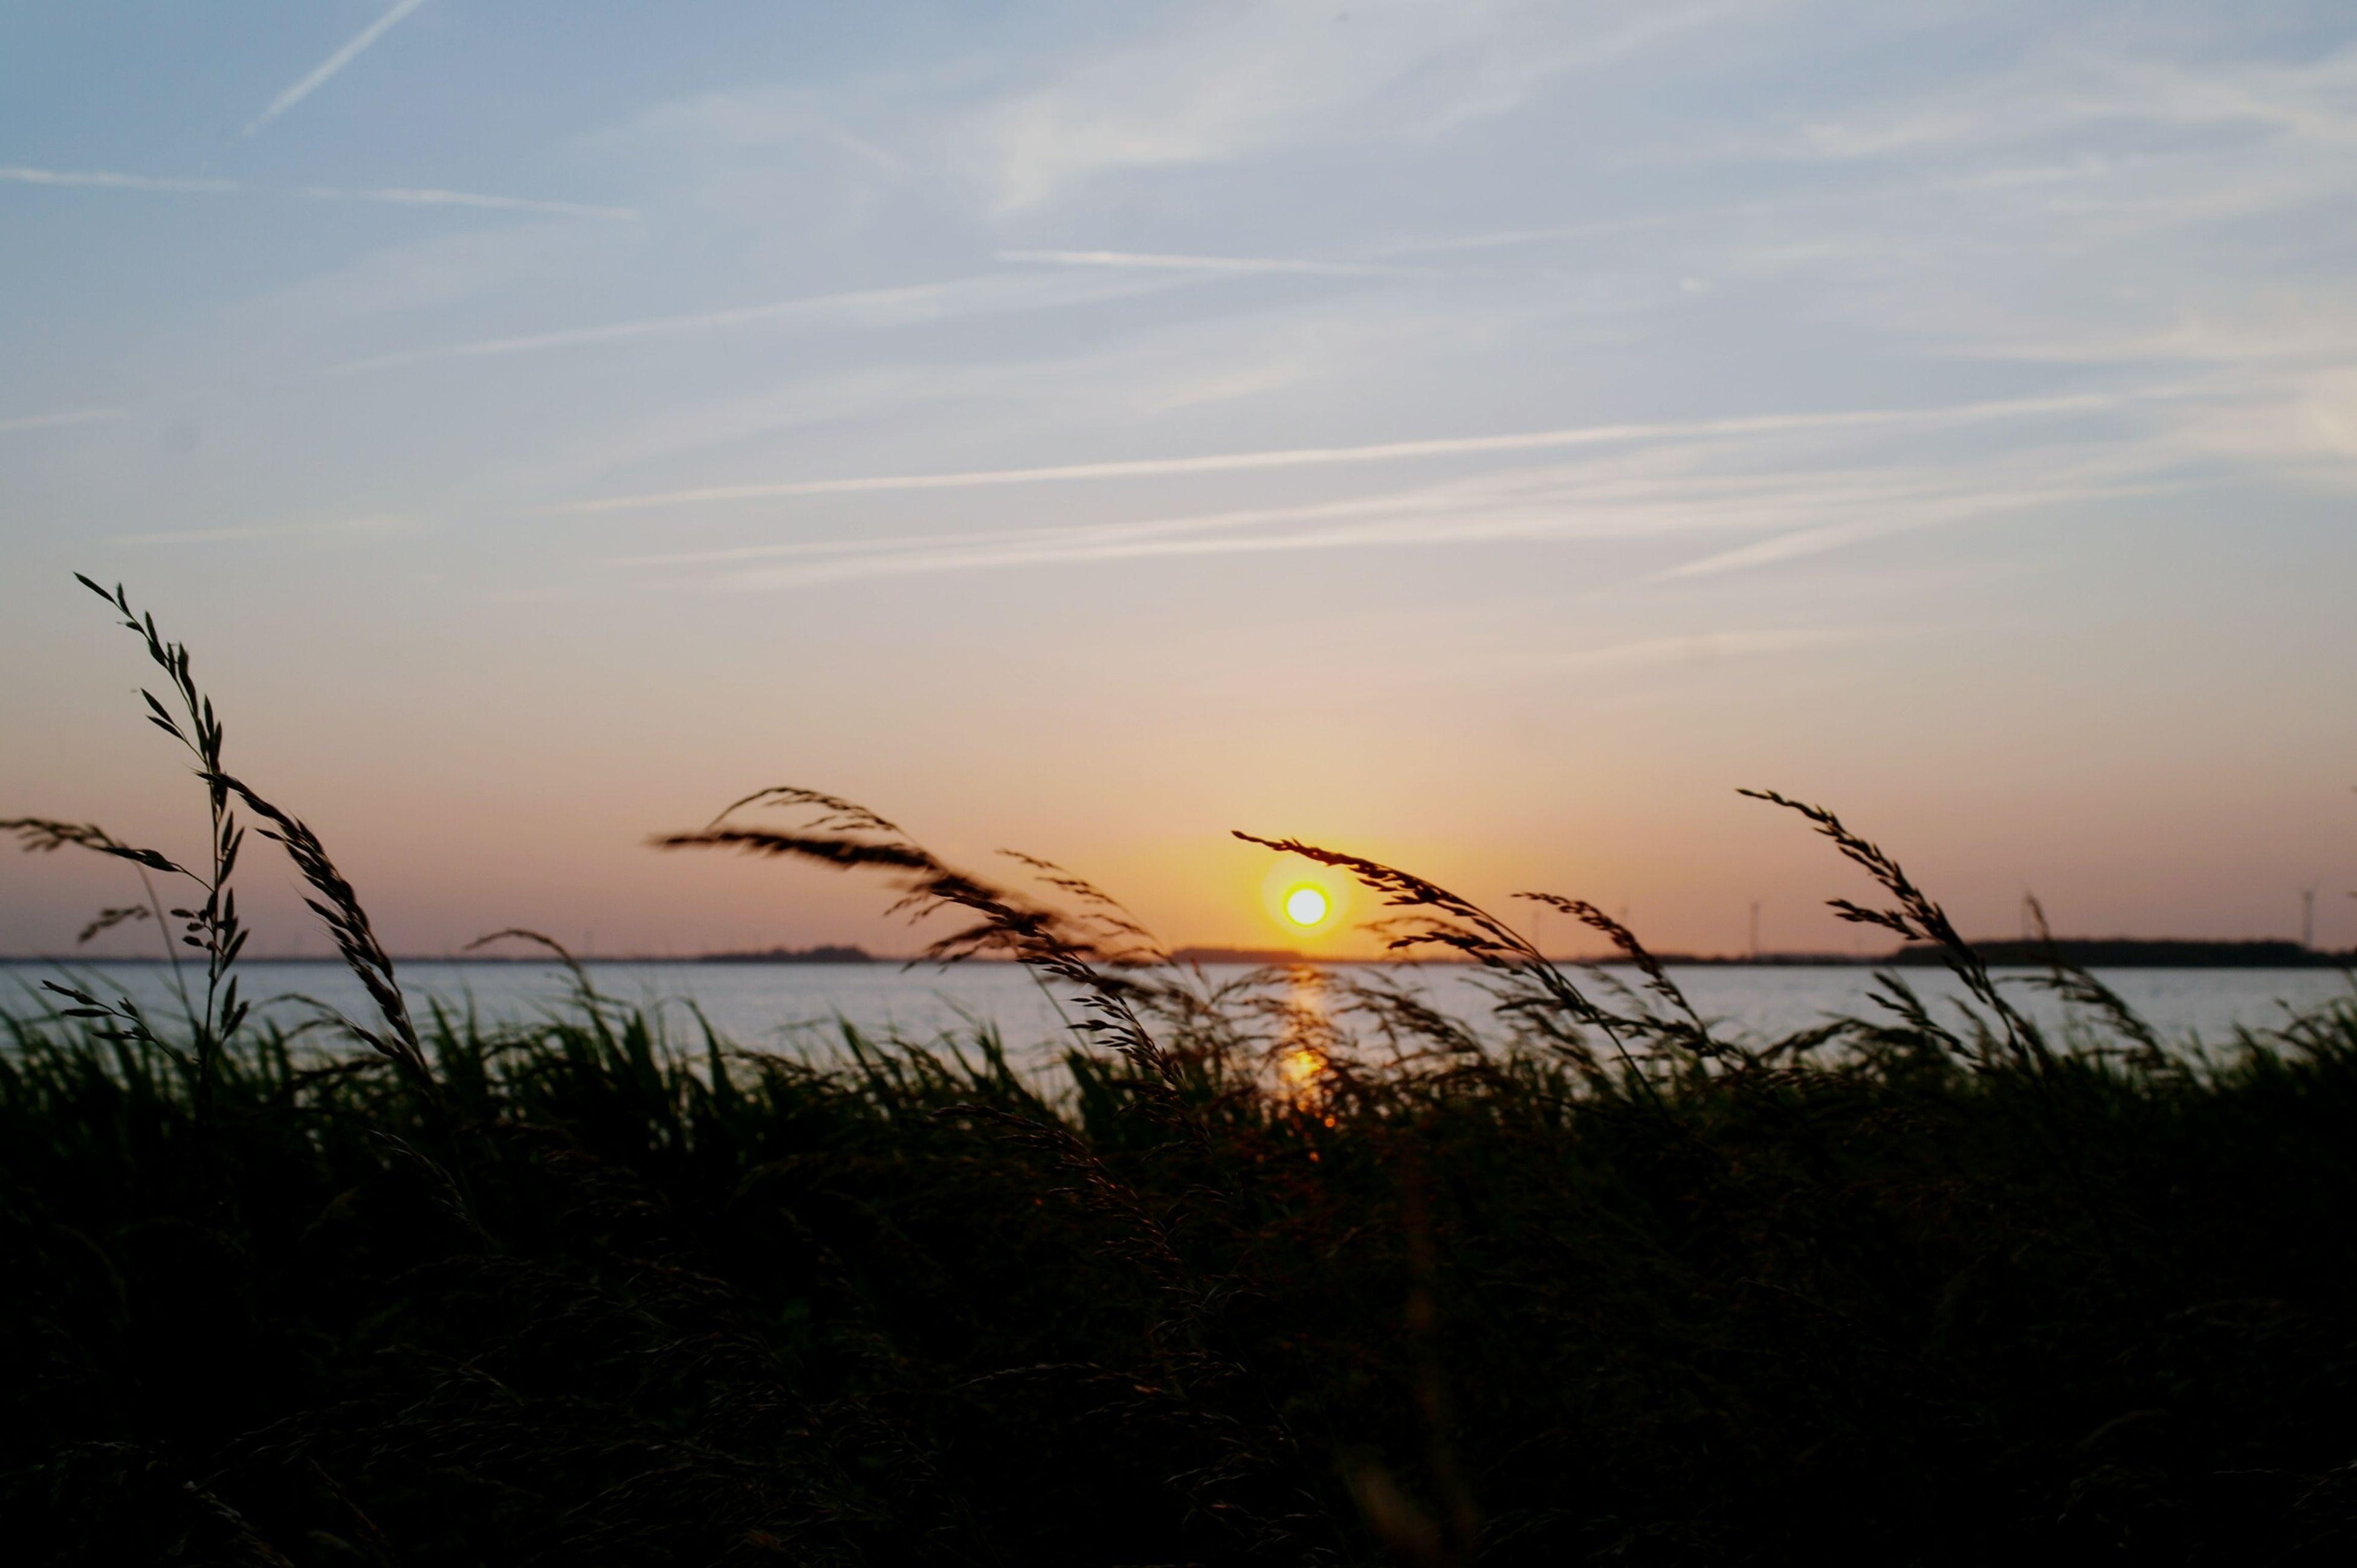 Boulevard sunset Netherlands Harderwijk Sunset View Beach